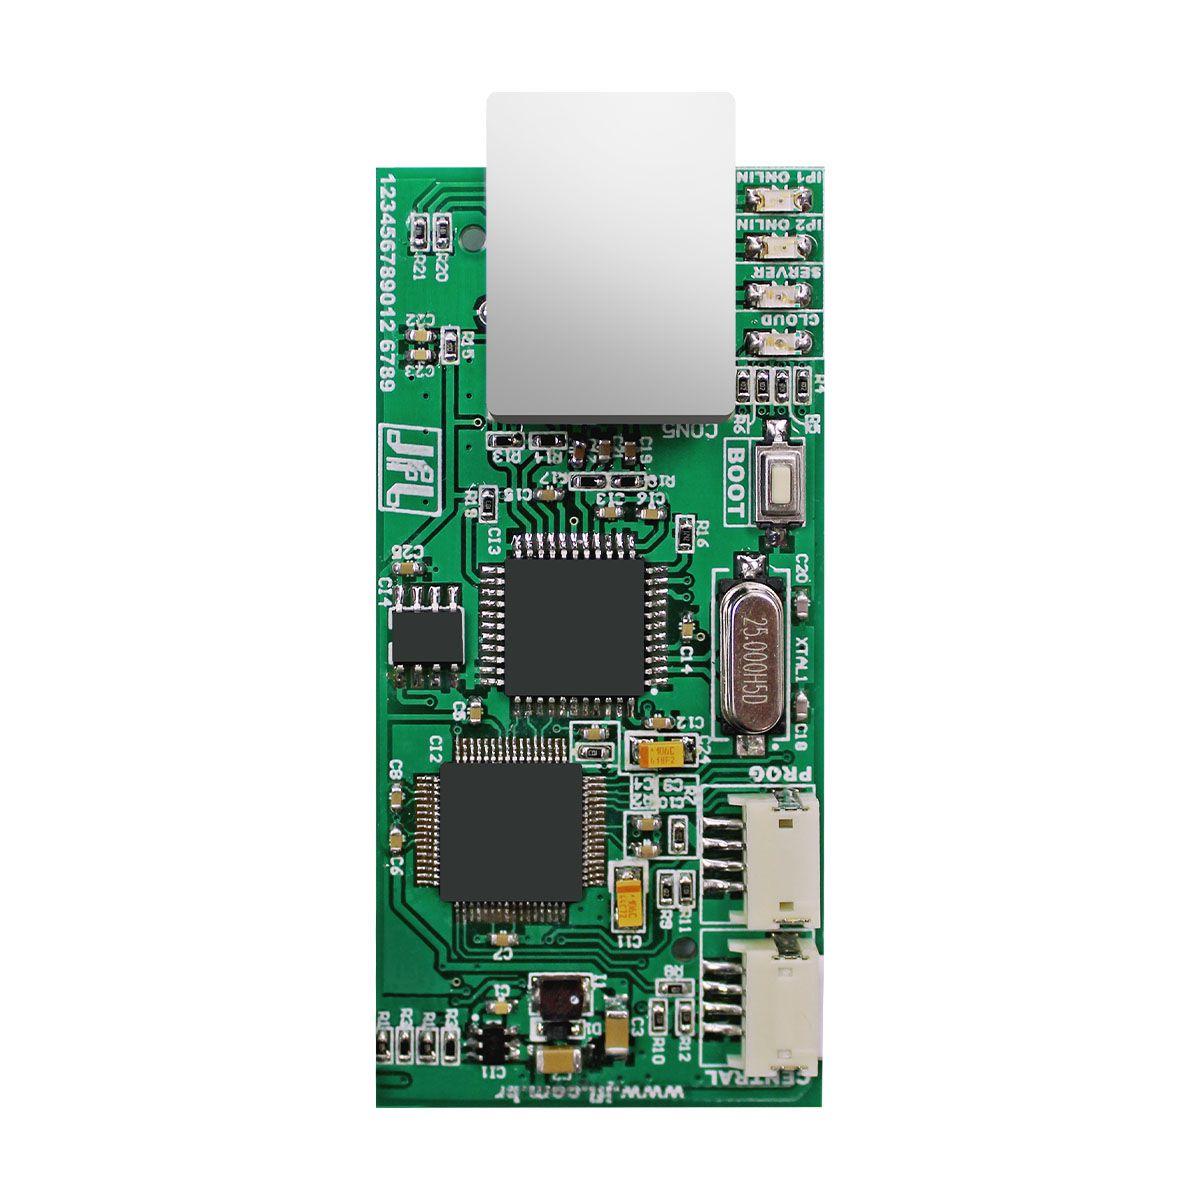 Kit Alarme Monitorado Via Aplicativo Smart Cloud 18 Jfl